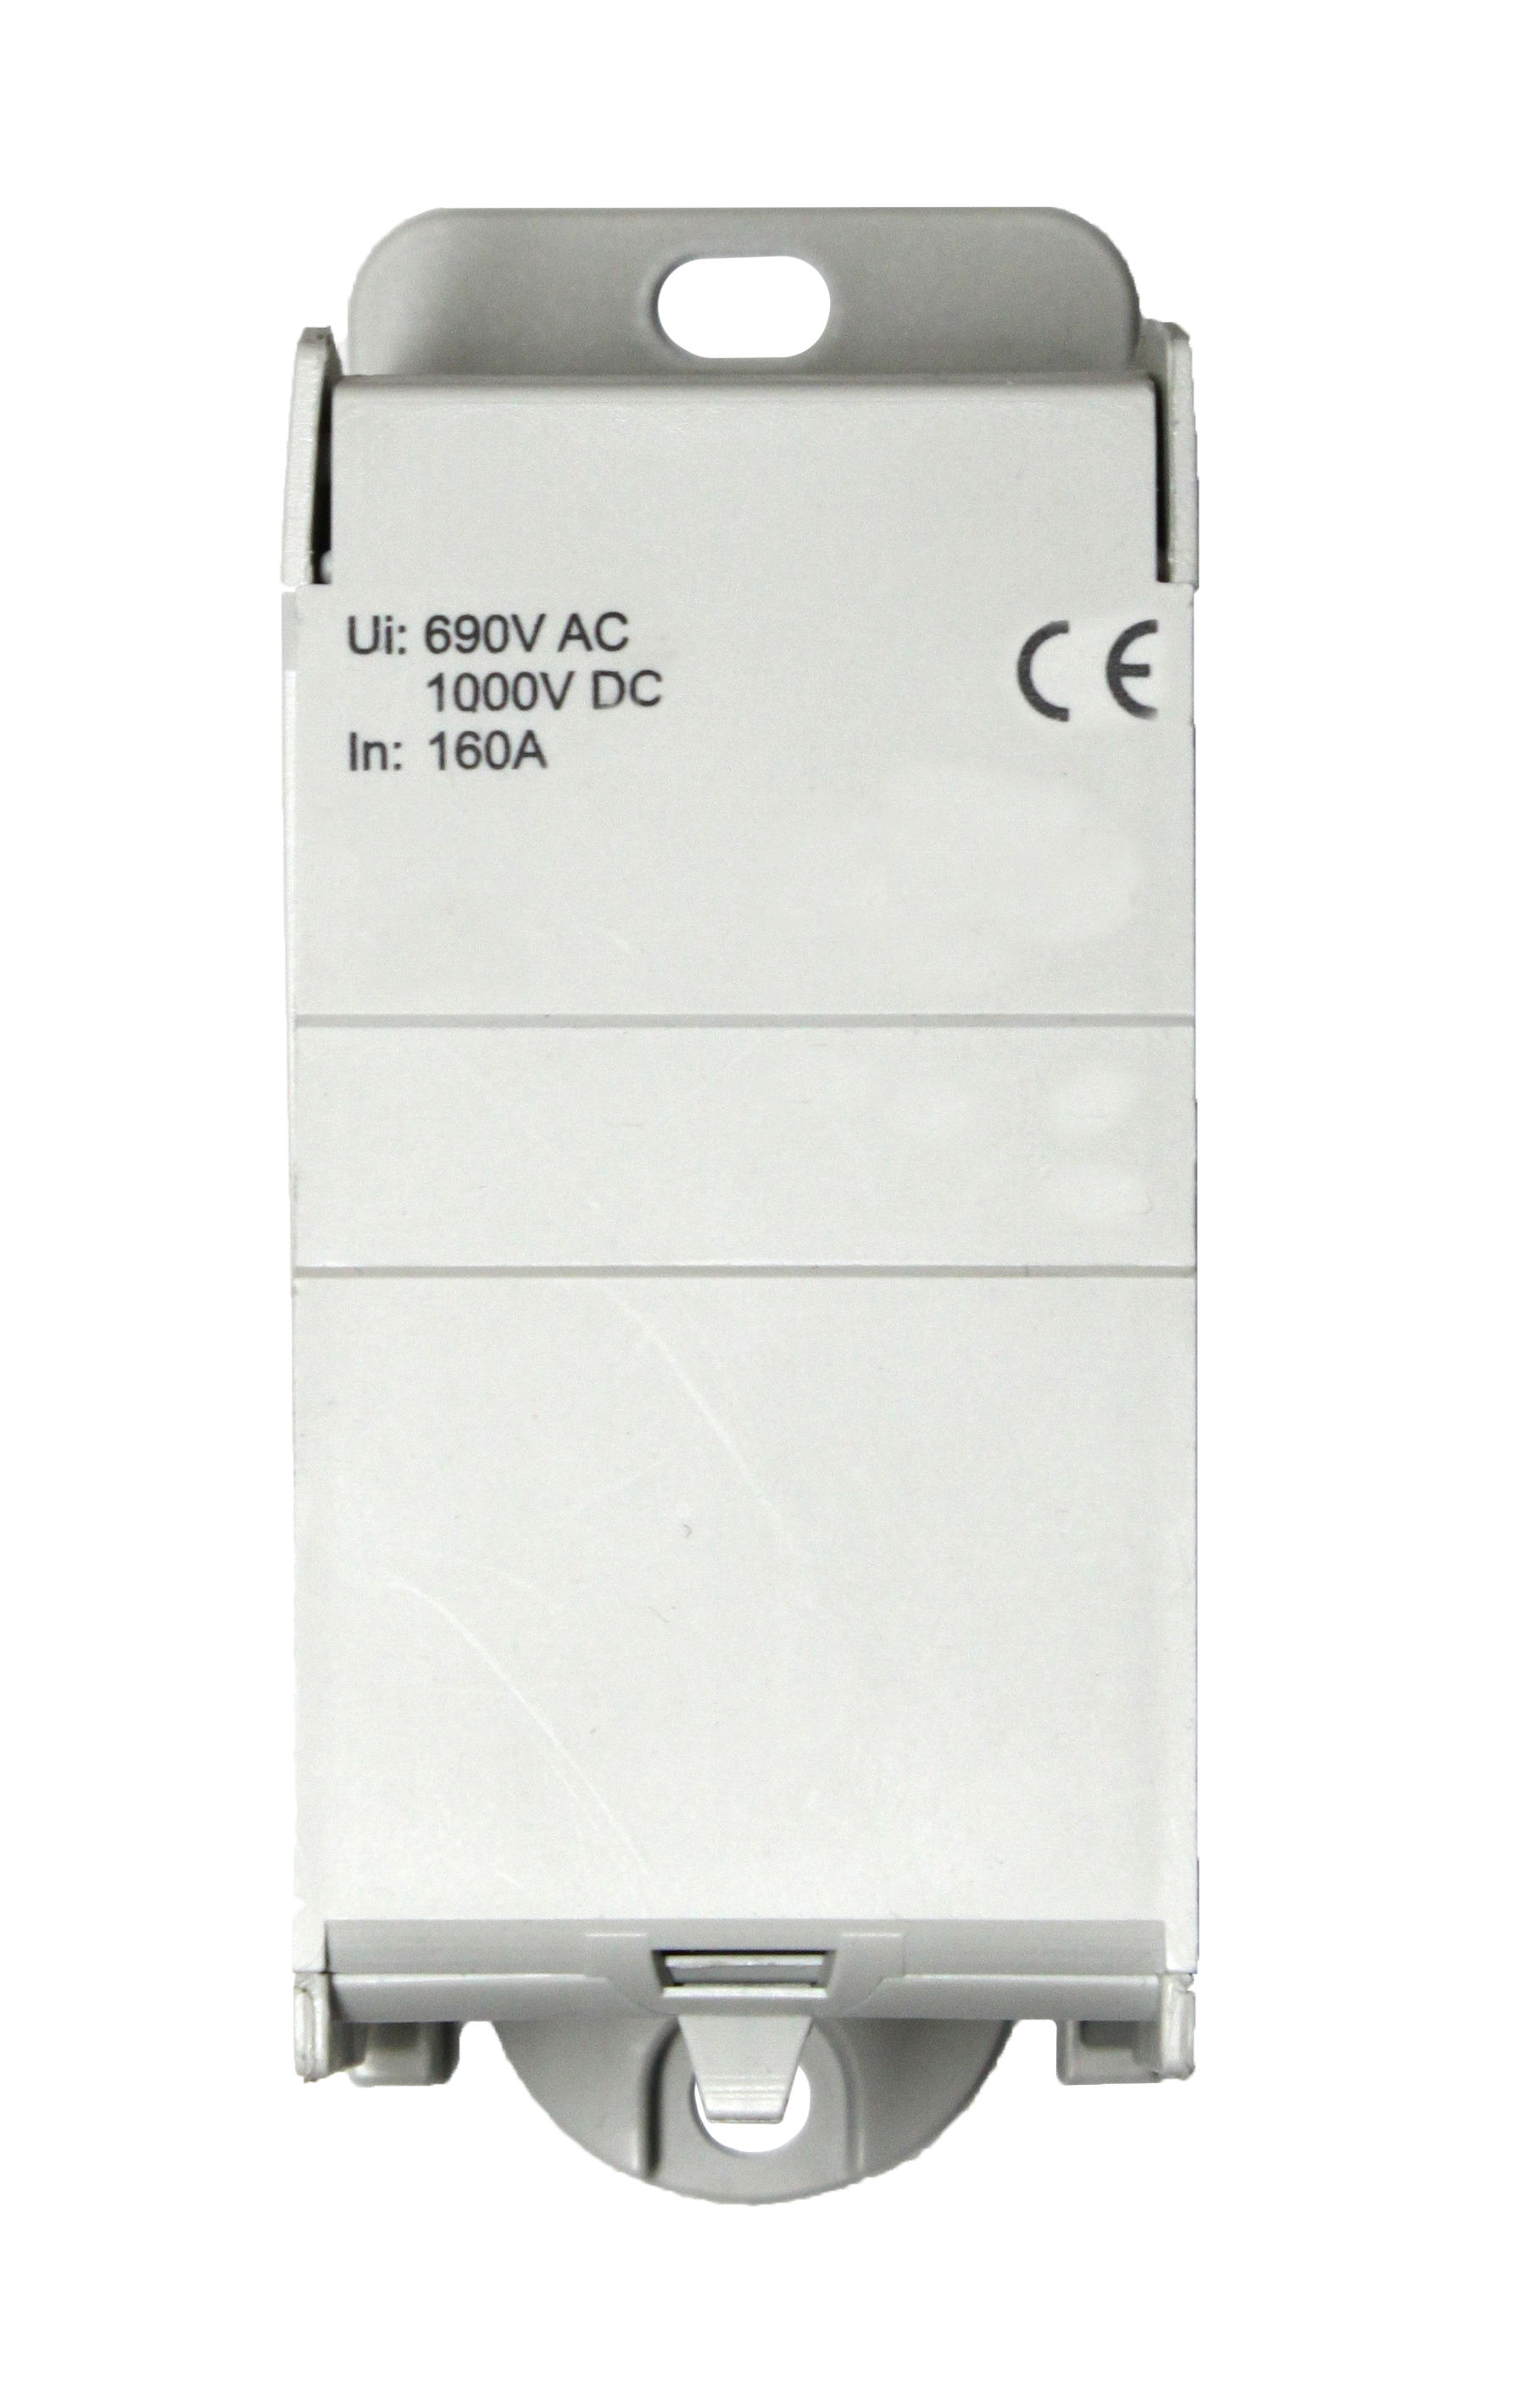 1 Stk Anschlussblock, 1-polig, 160A, zu 1x70mm², ab 8x16mm² IKB01170--